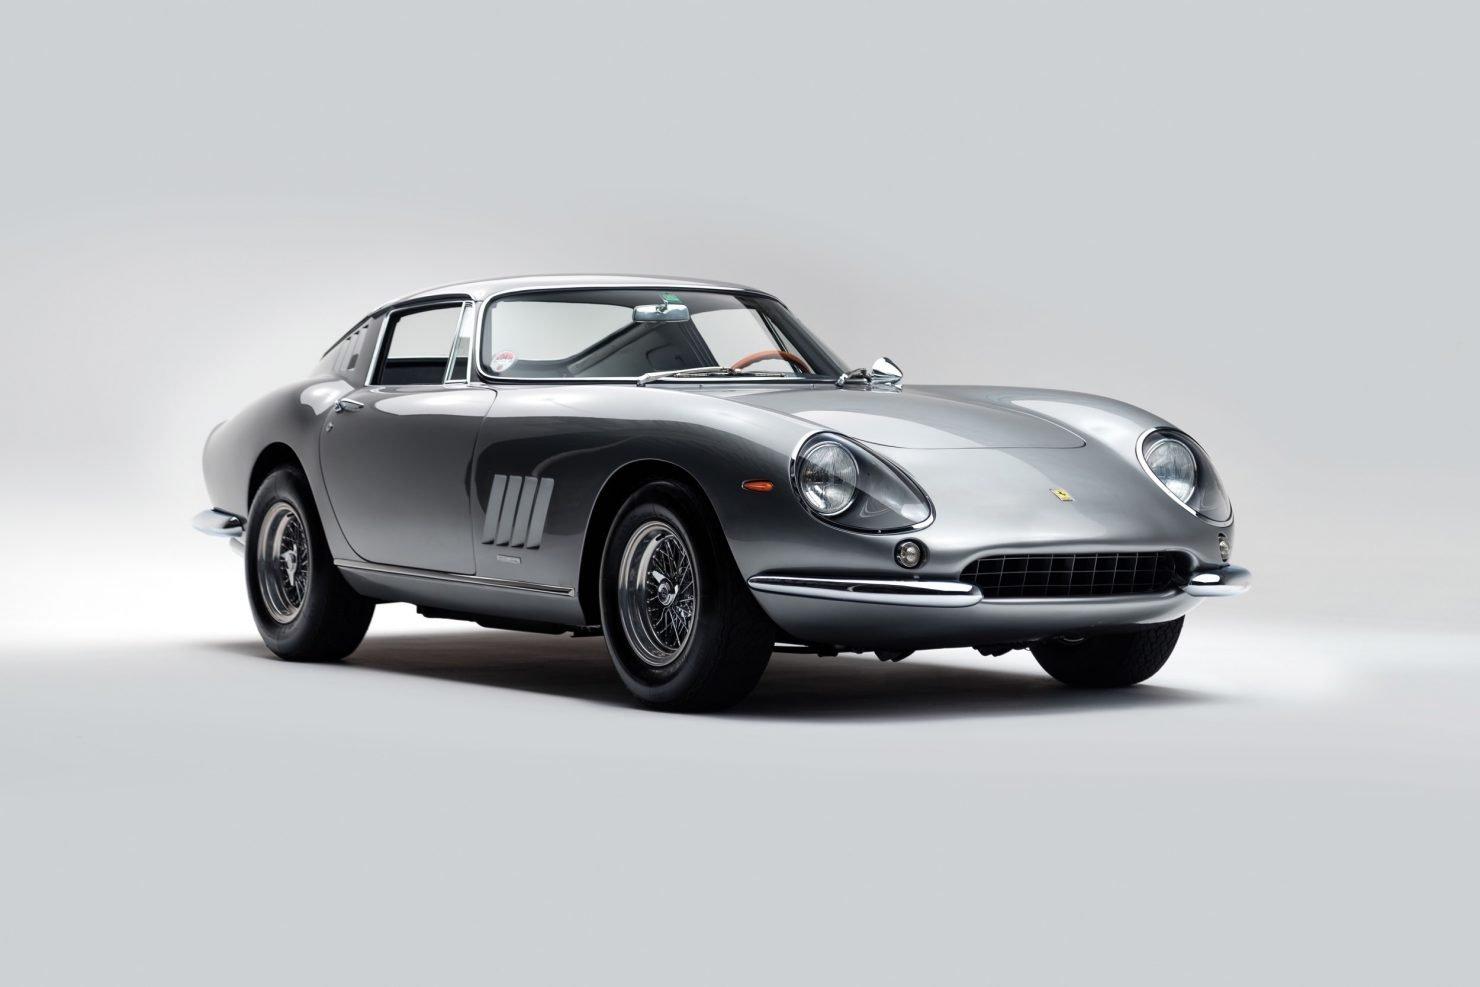 ferrari 275 gtb car 1 1480x987 - 1965 Ferrari 275 GTB/6C Alloy